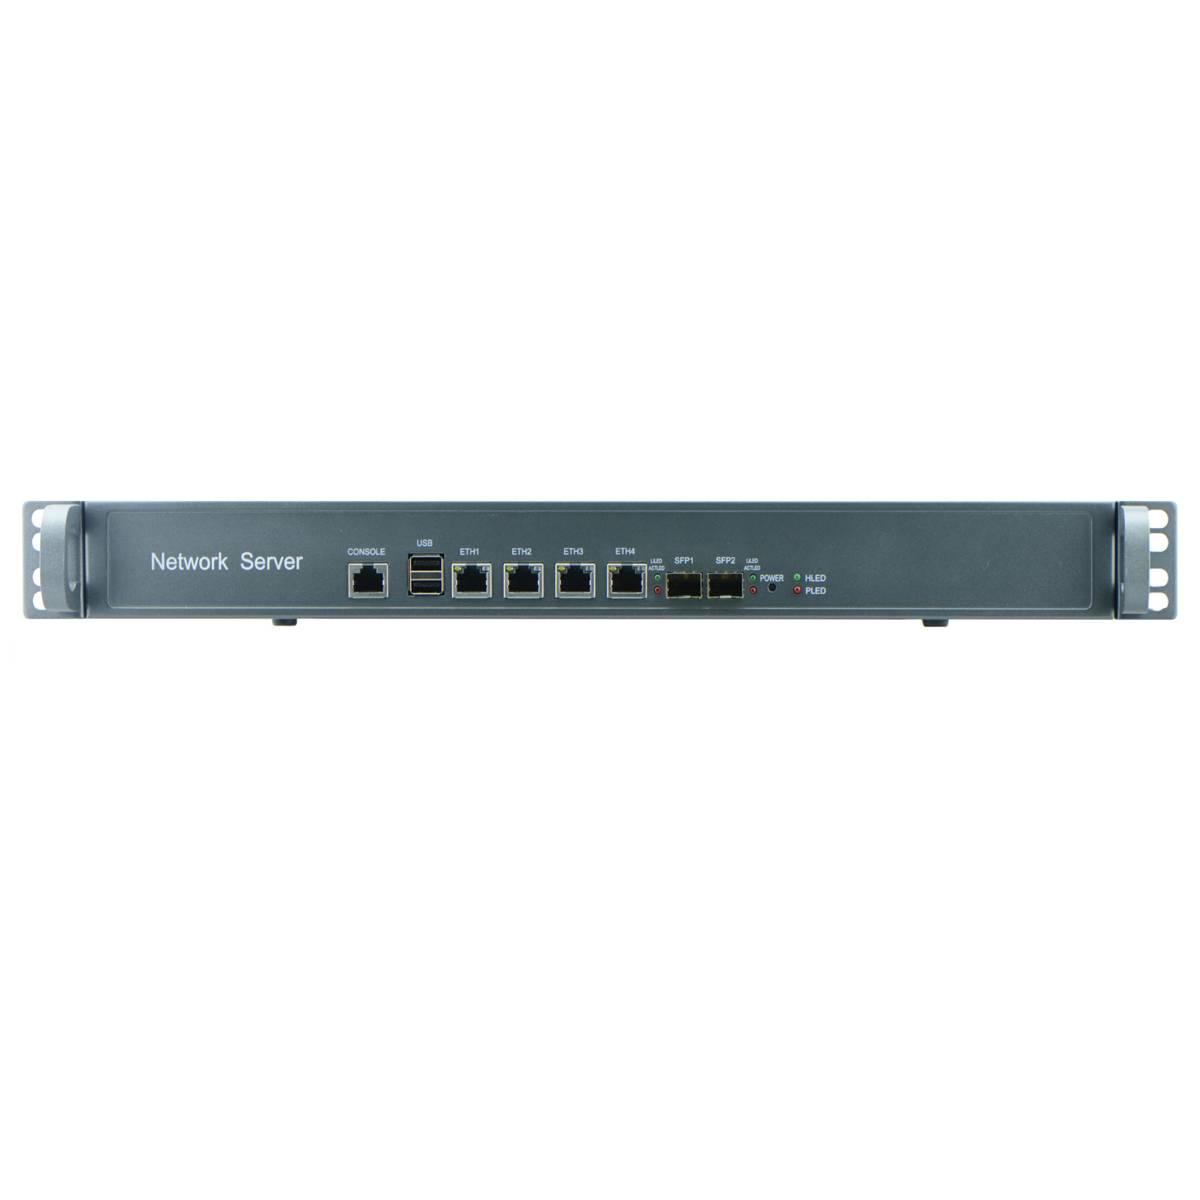 Intel Celeron C1037U 1U Firewall Barebone for Network Security Application with 4Nic, 2 SFP Option